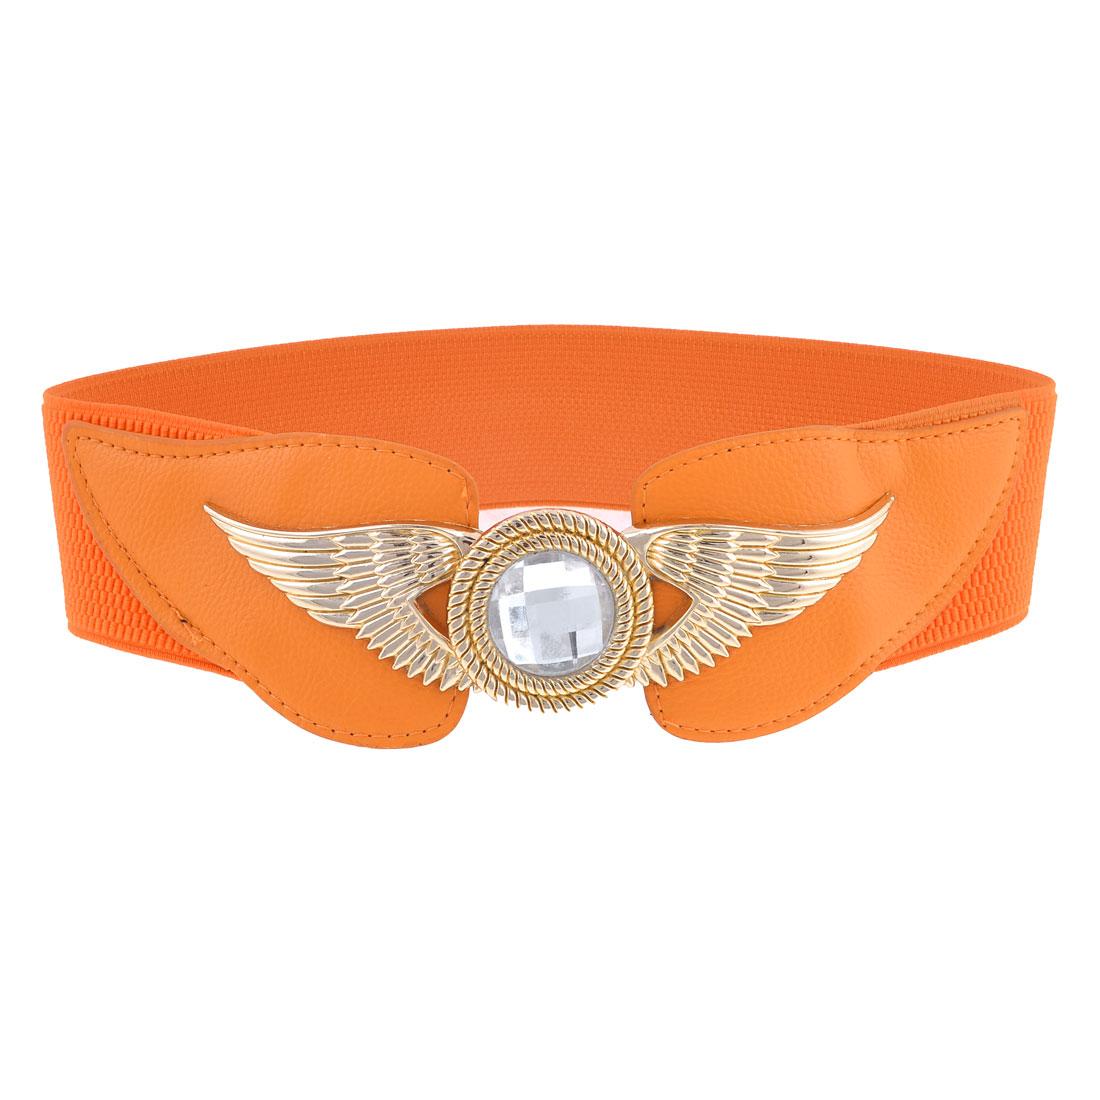 6cm Wide Band Metal Interlocking Buckle Orange Elastic Cinch Belt for Lady